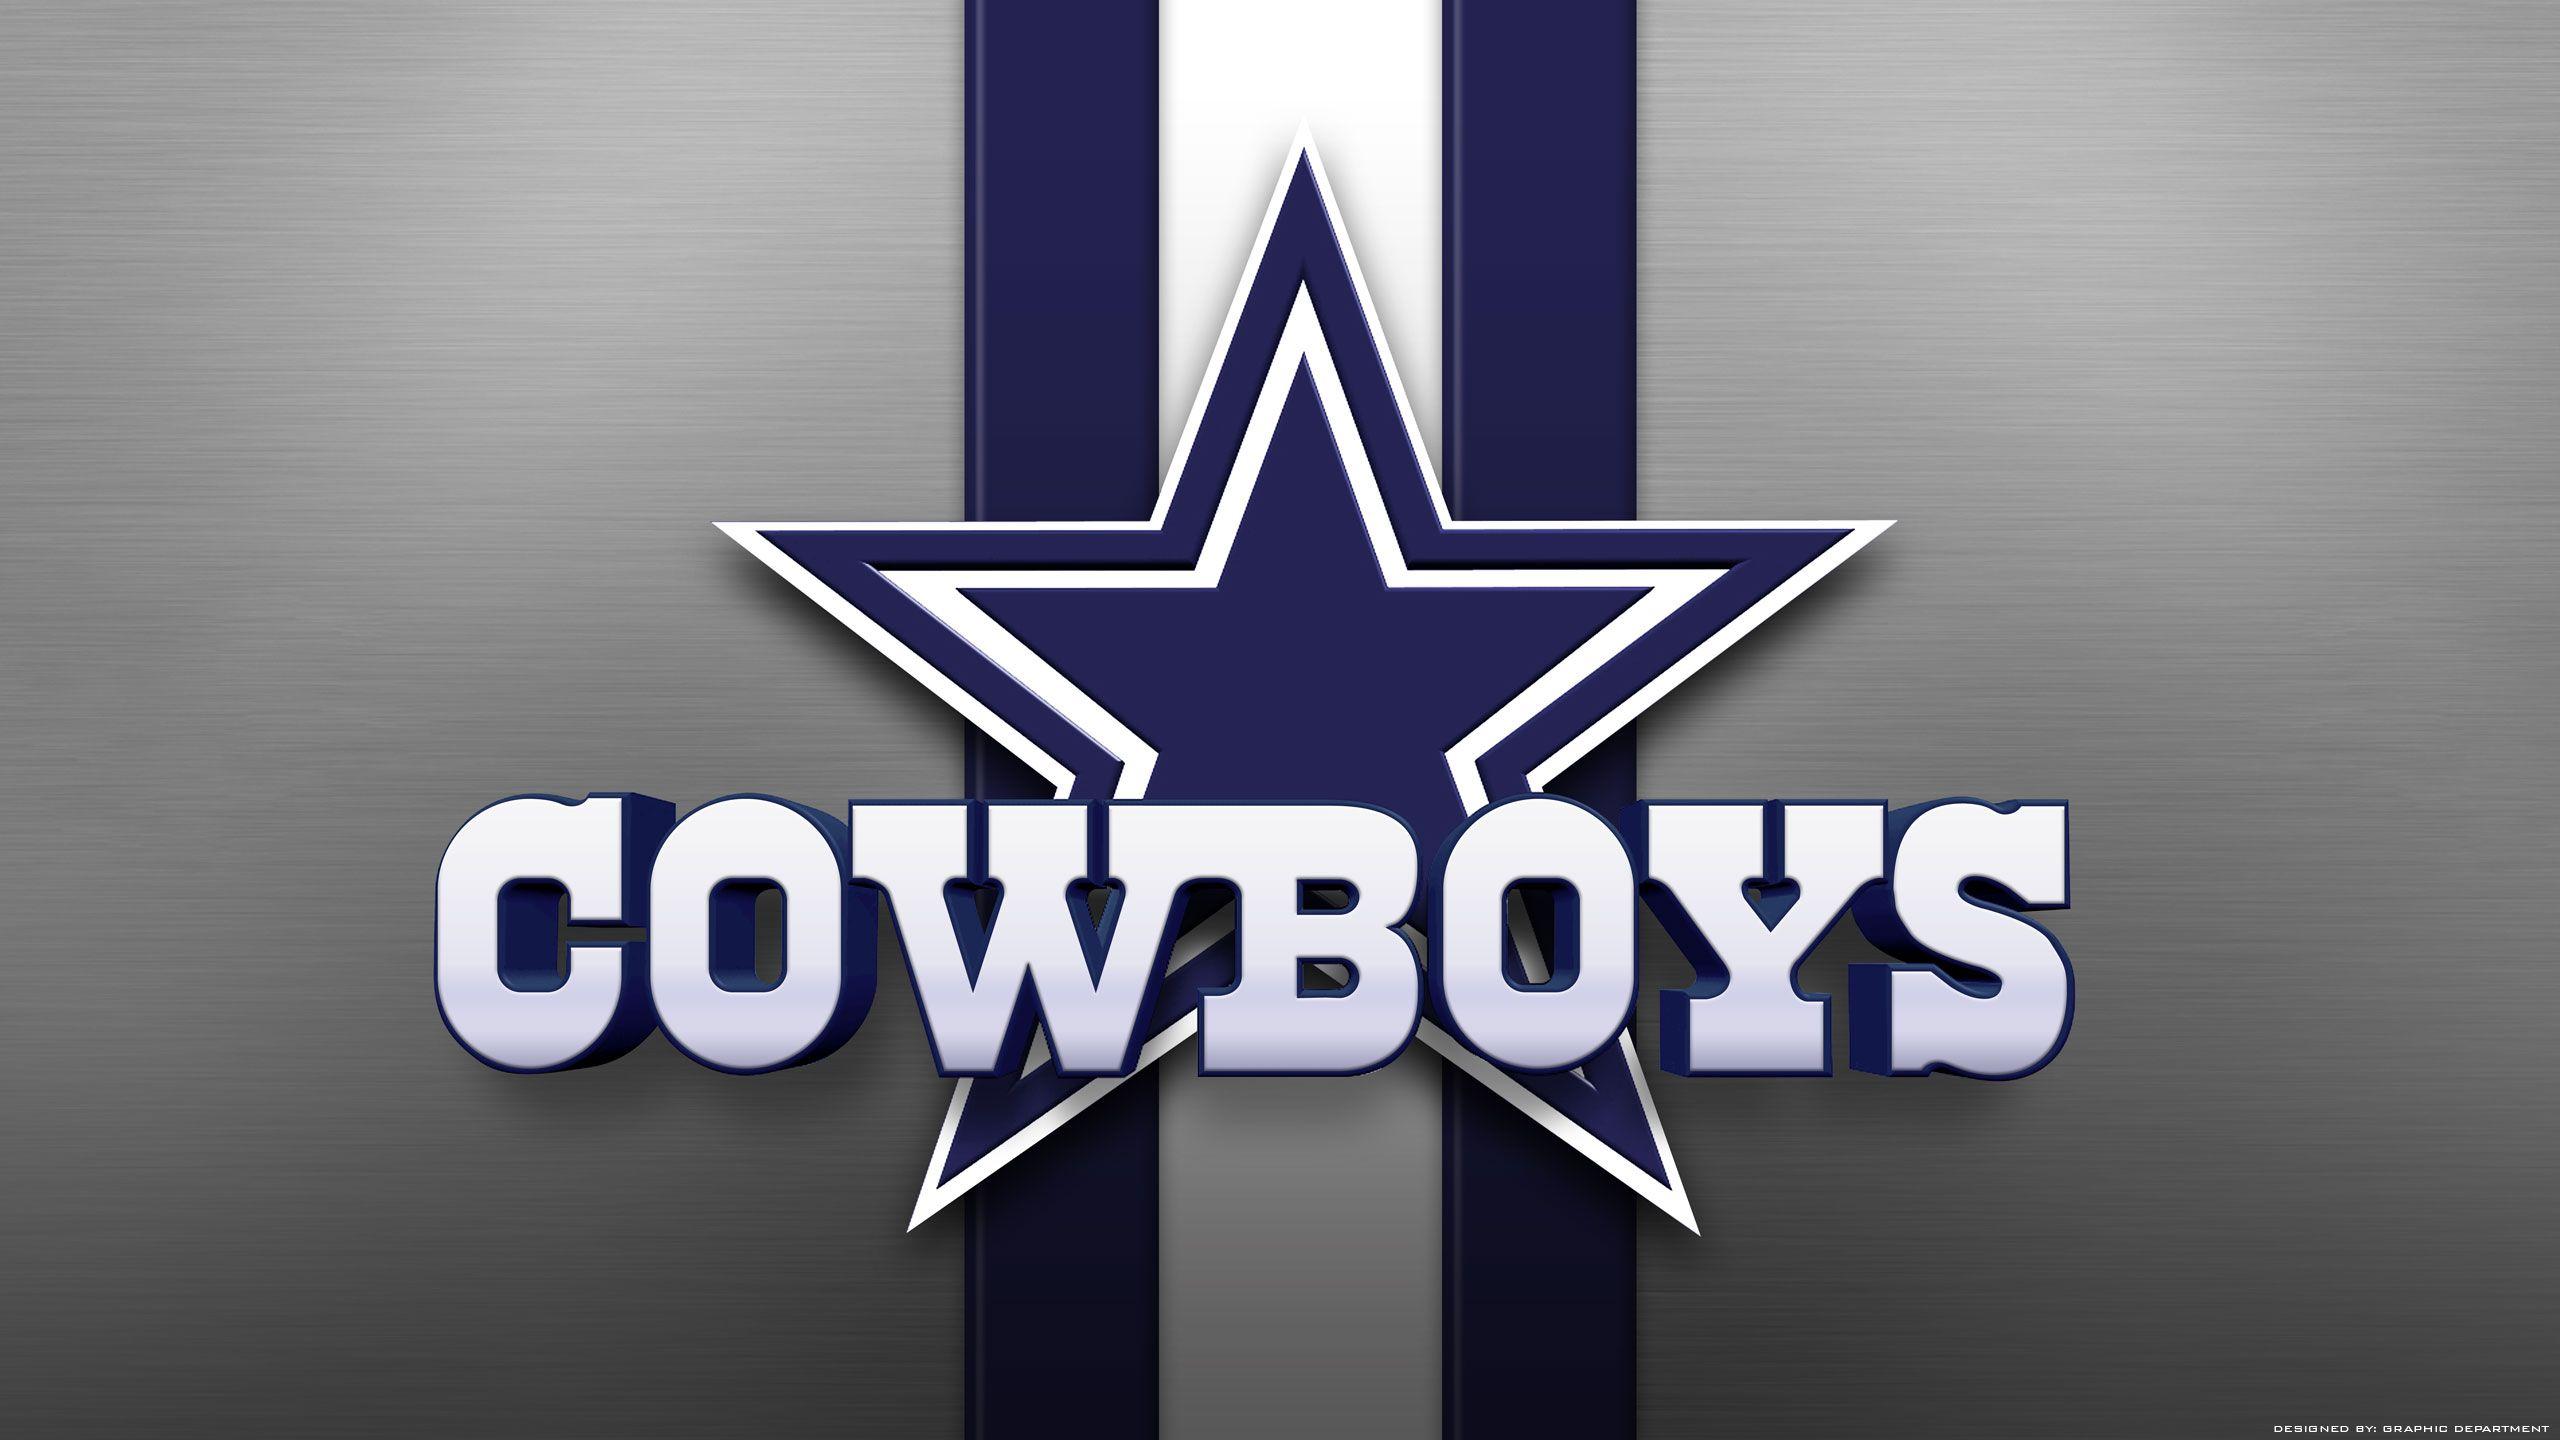 Dallas Cowboys Wallpaper For Iphone - Dallas Cowboys Wallpaper Hd - HD Wallpaper